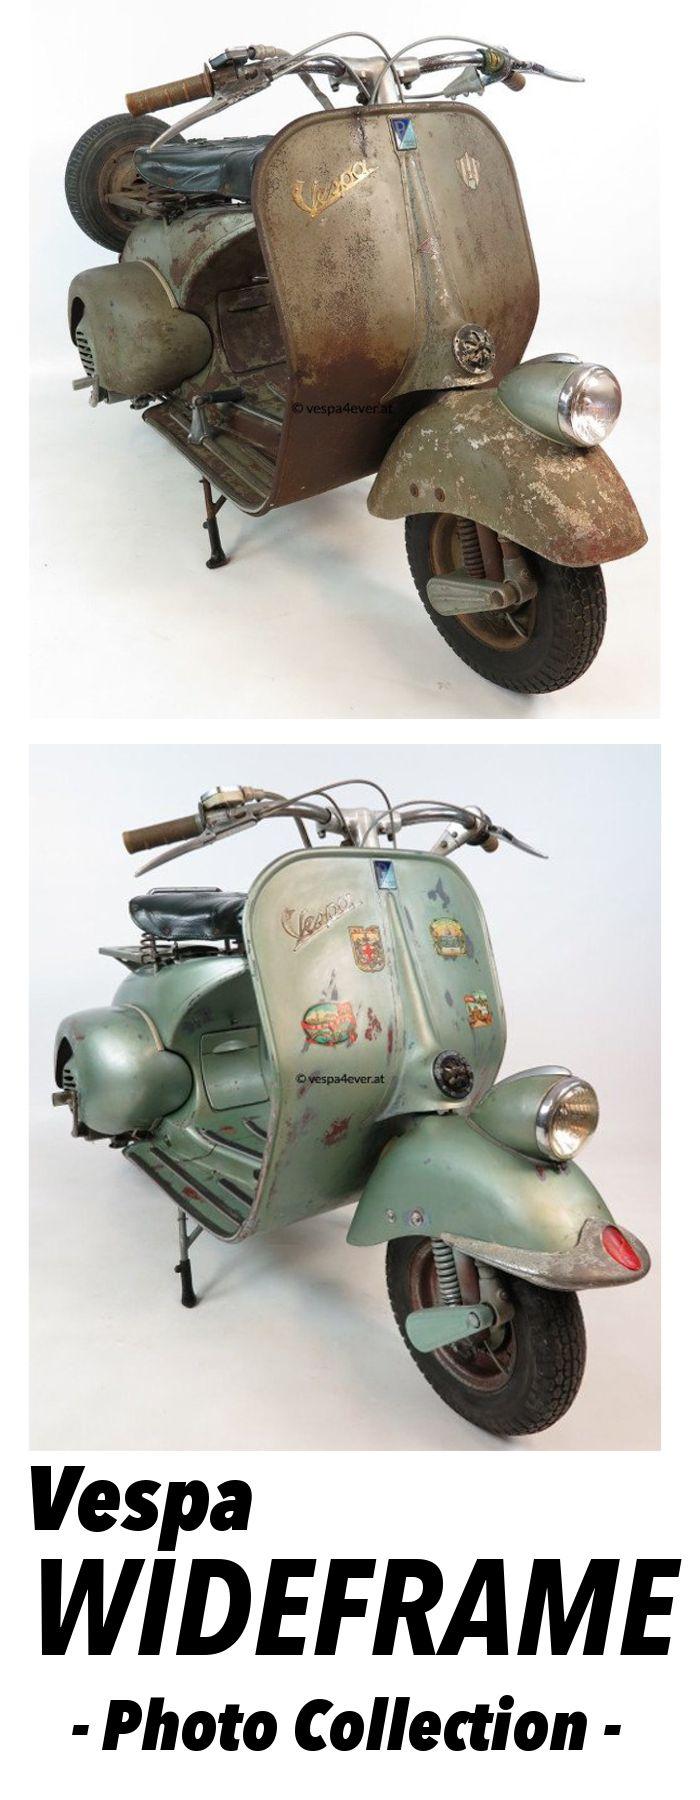 Vespa Wideframe Vintage Scooters